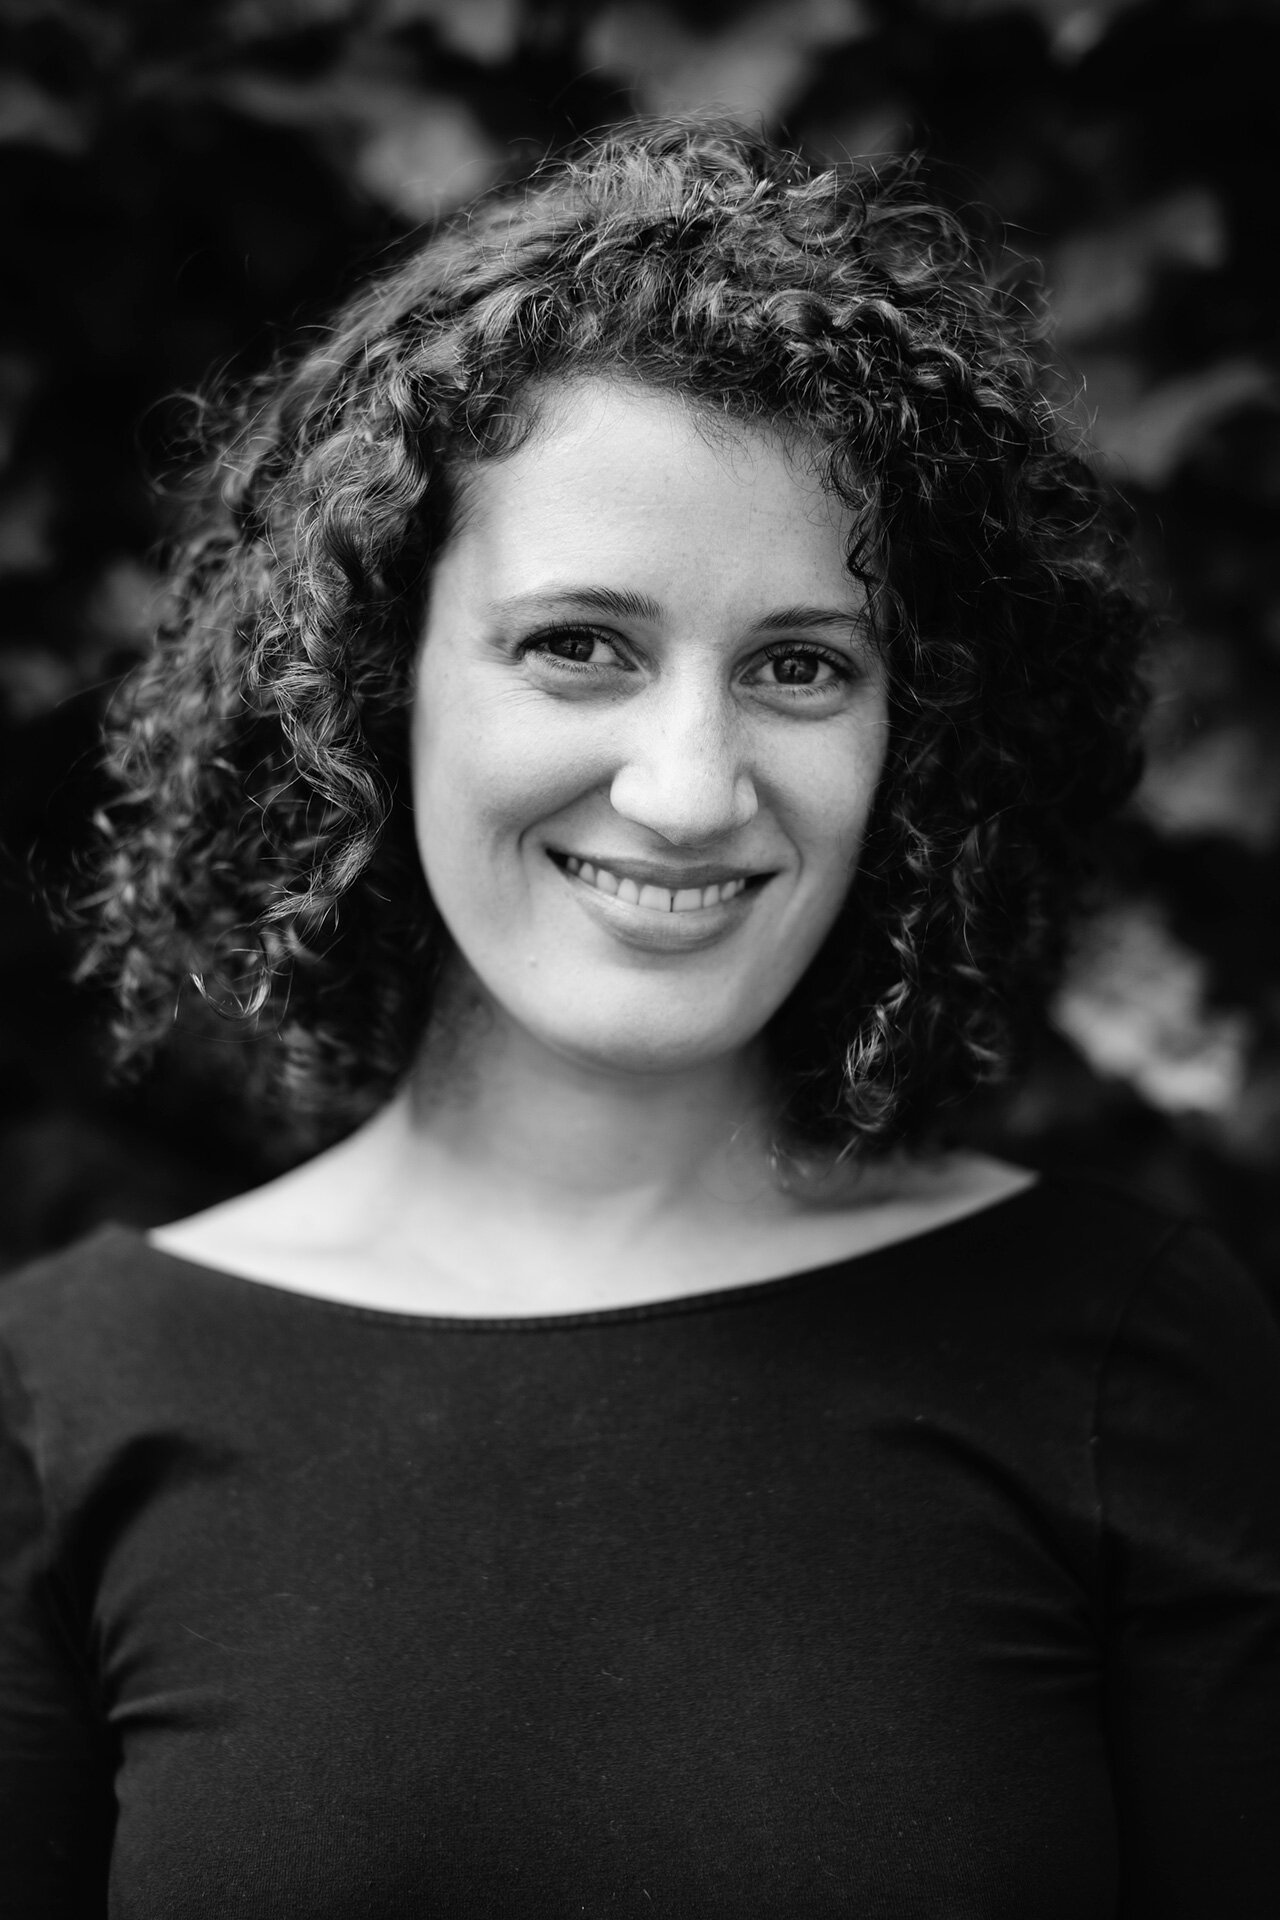 Chiara Vettoretti - Manager Produkt & Projektechiara@merconic.de